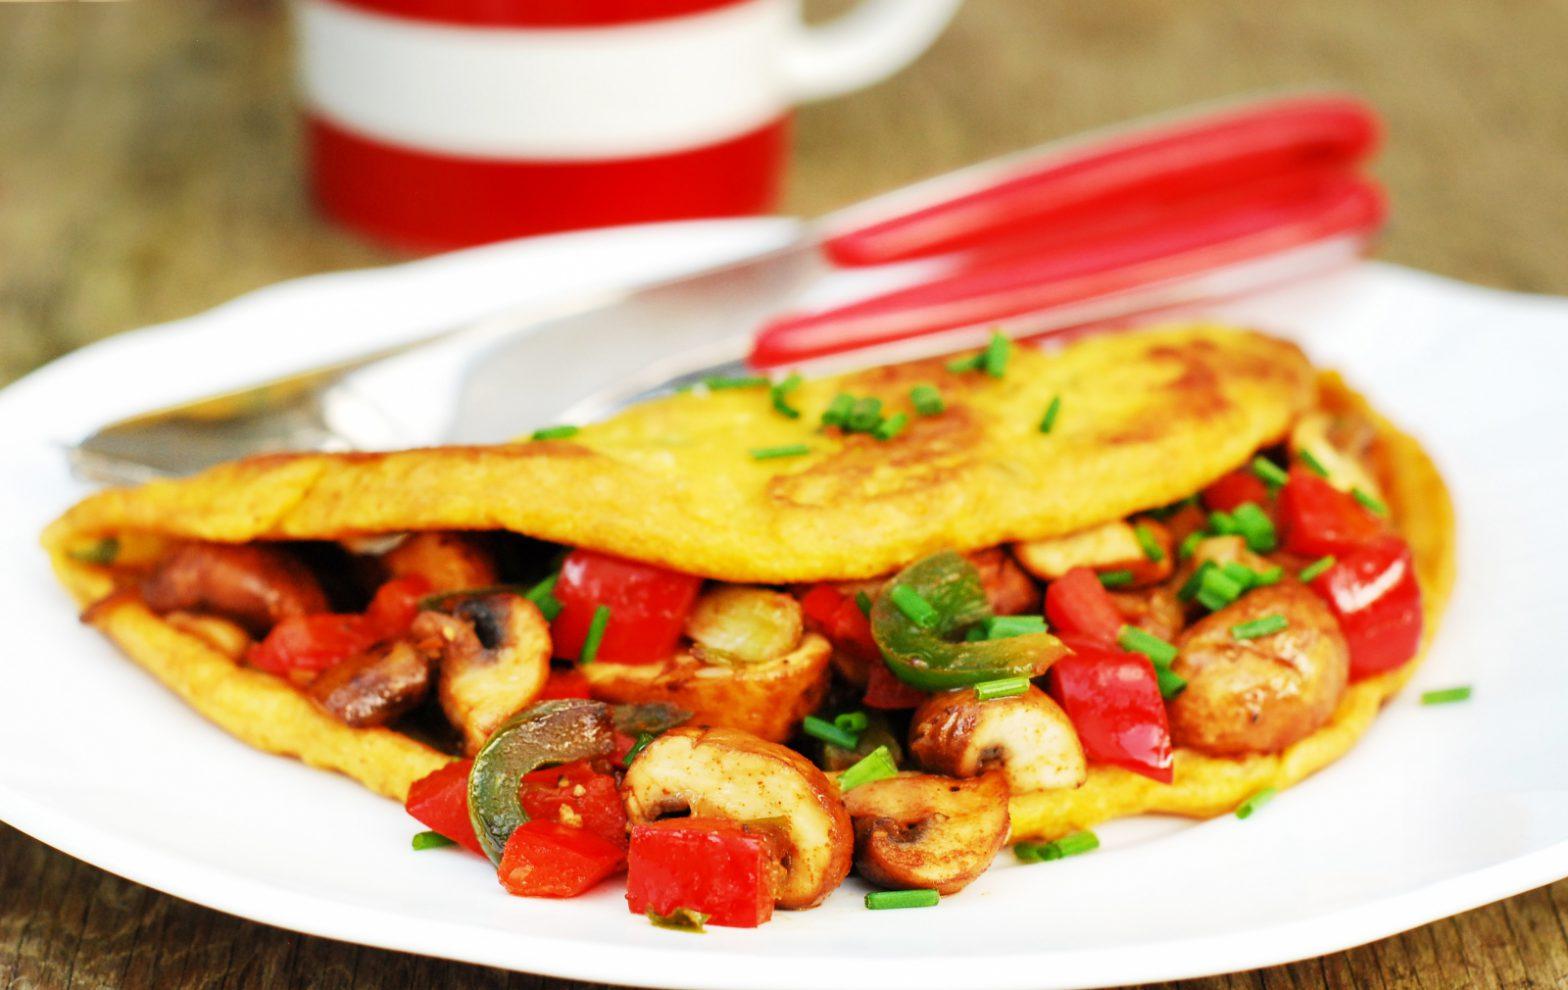 Brunch Omelette with Smoky Garlic Mushrooms